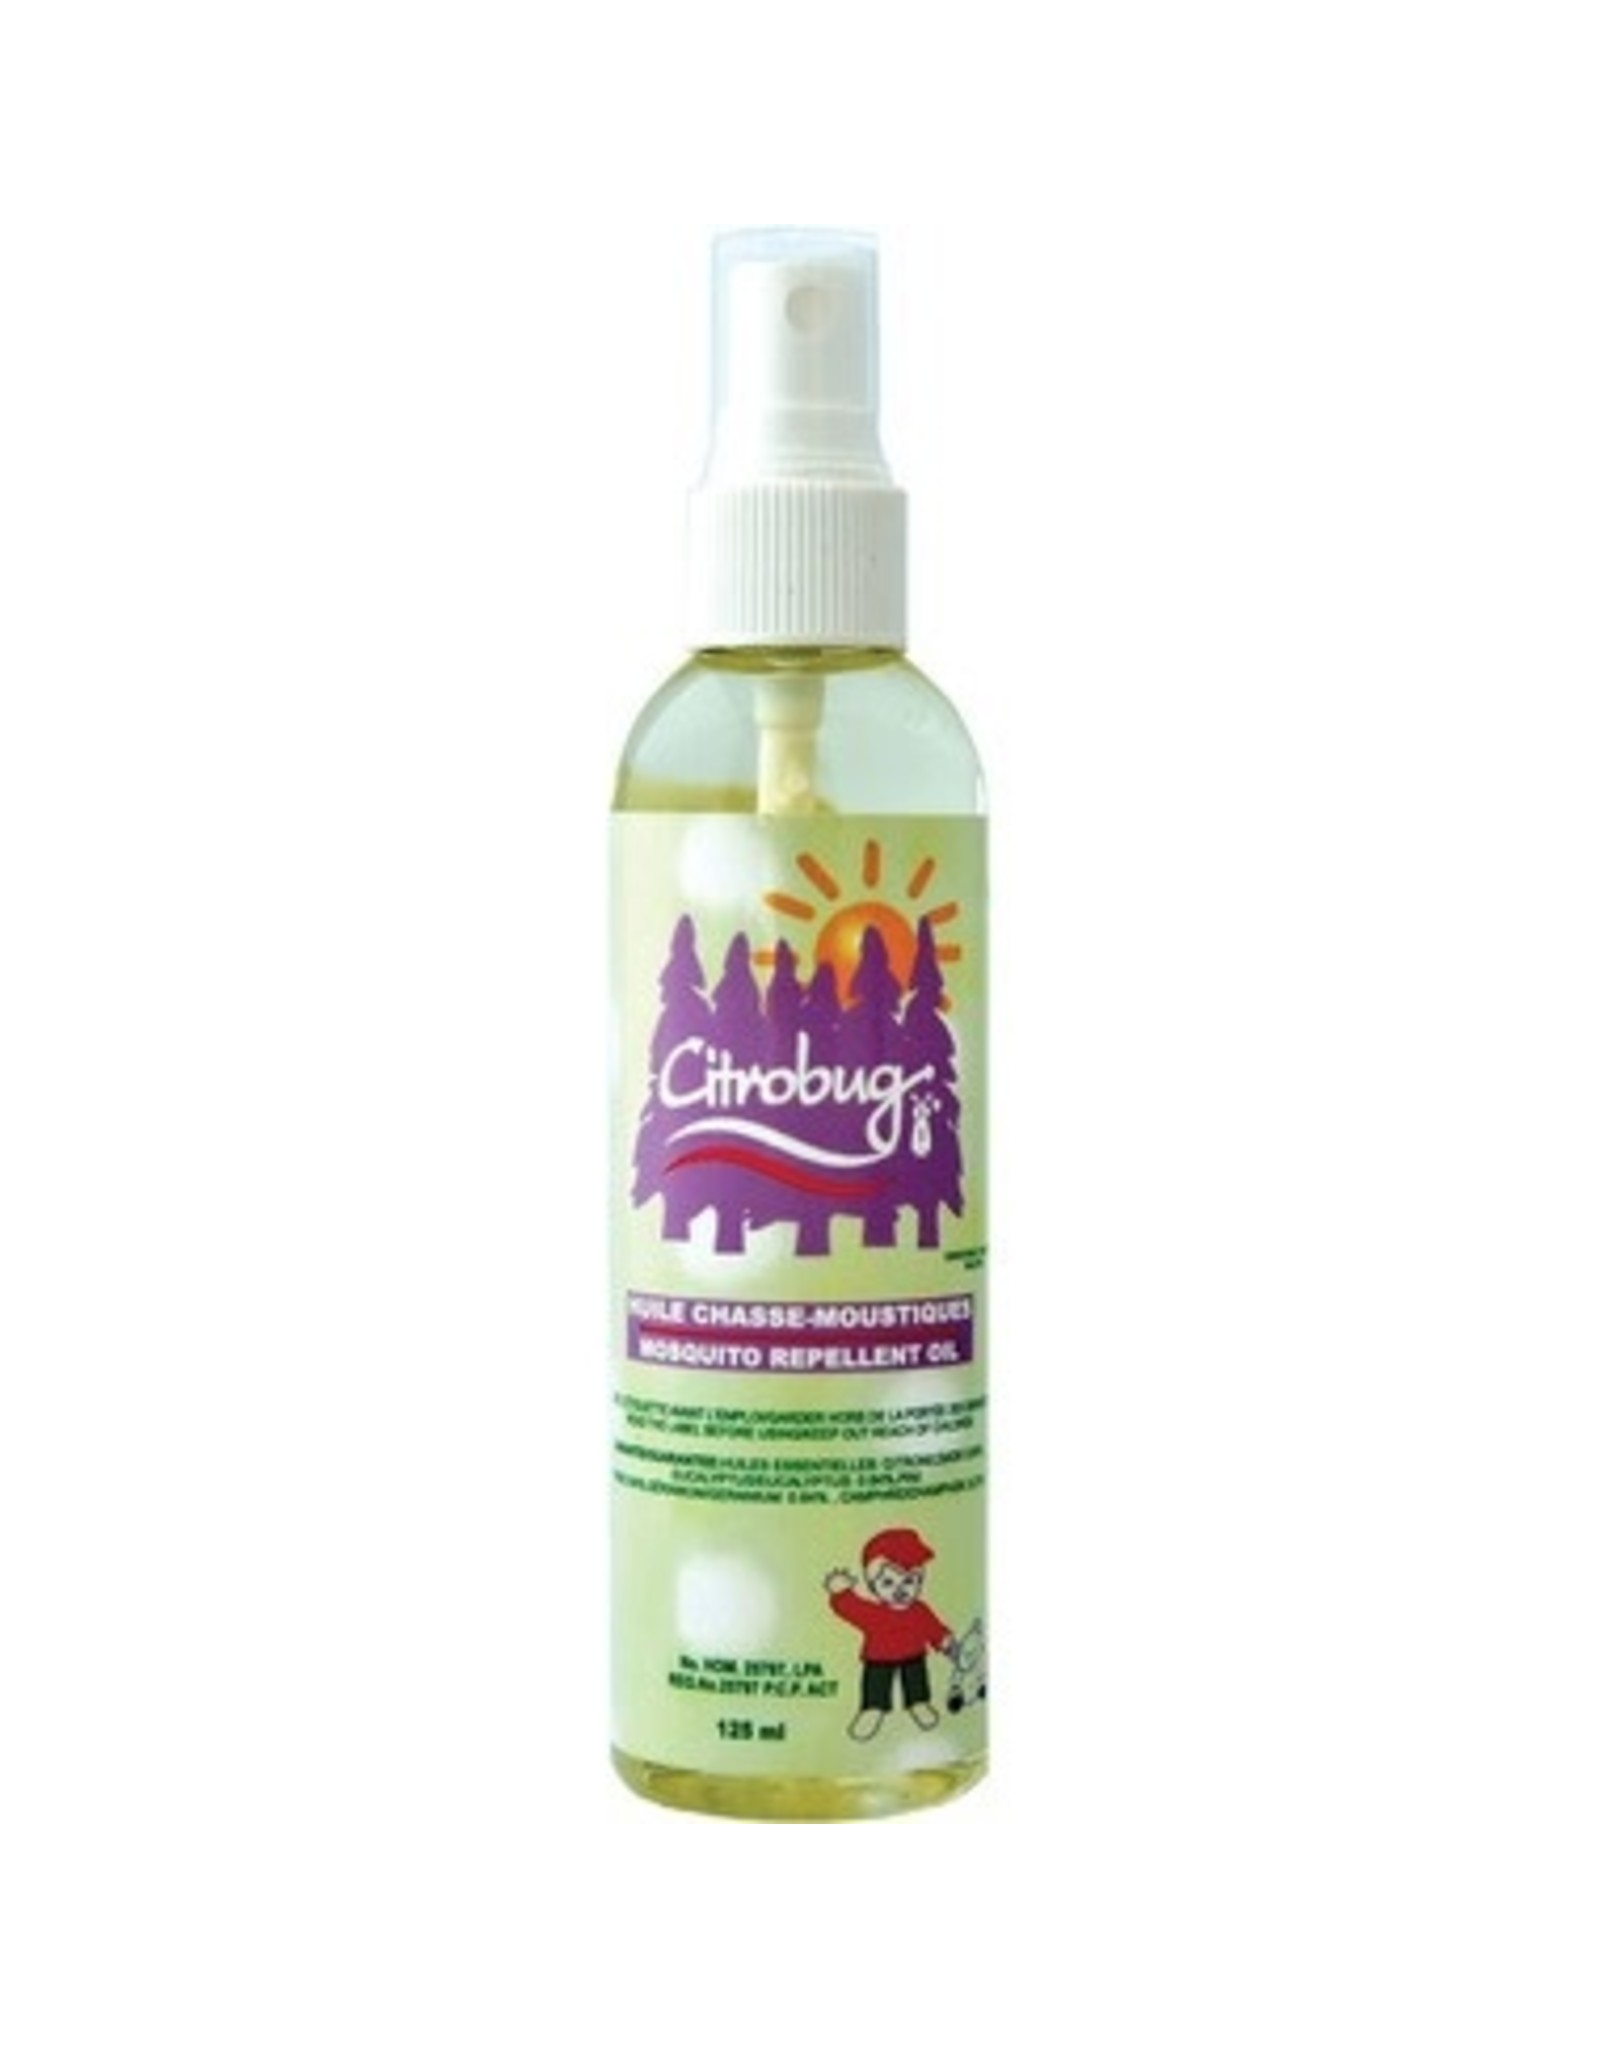 Citrobug Mosquito Repellent for Kids